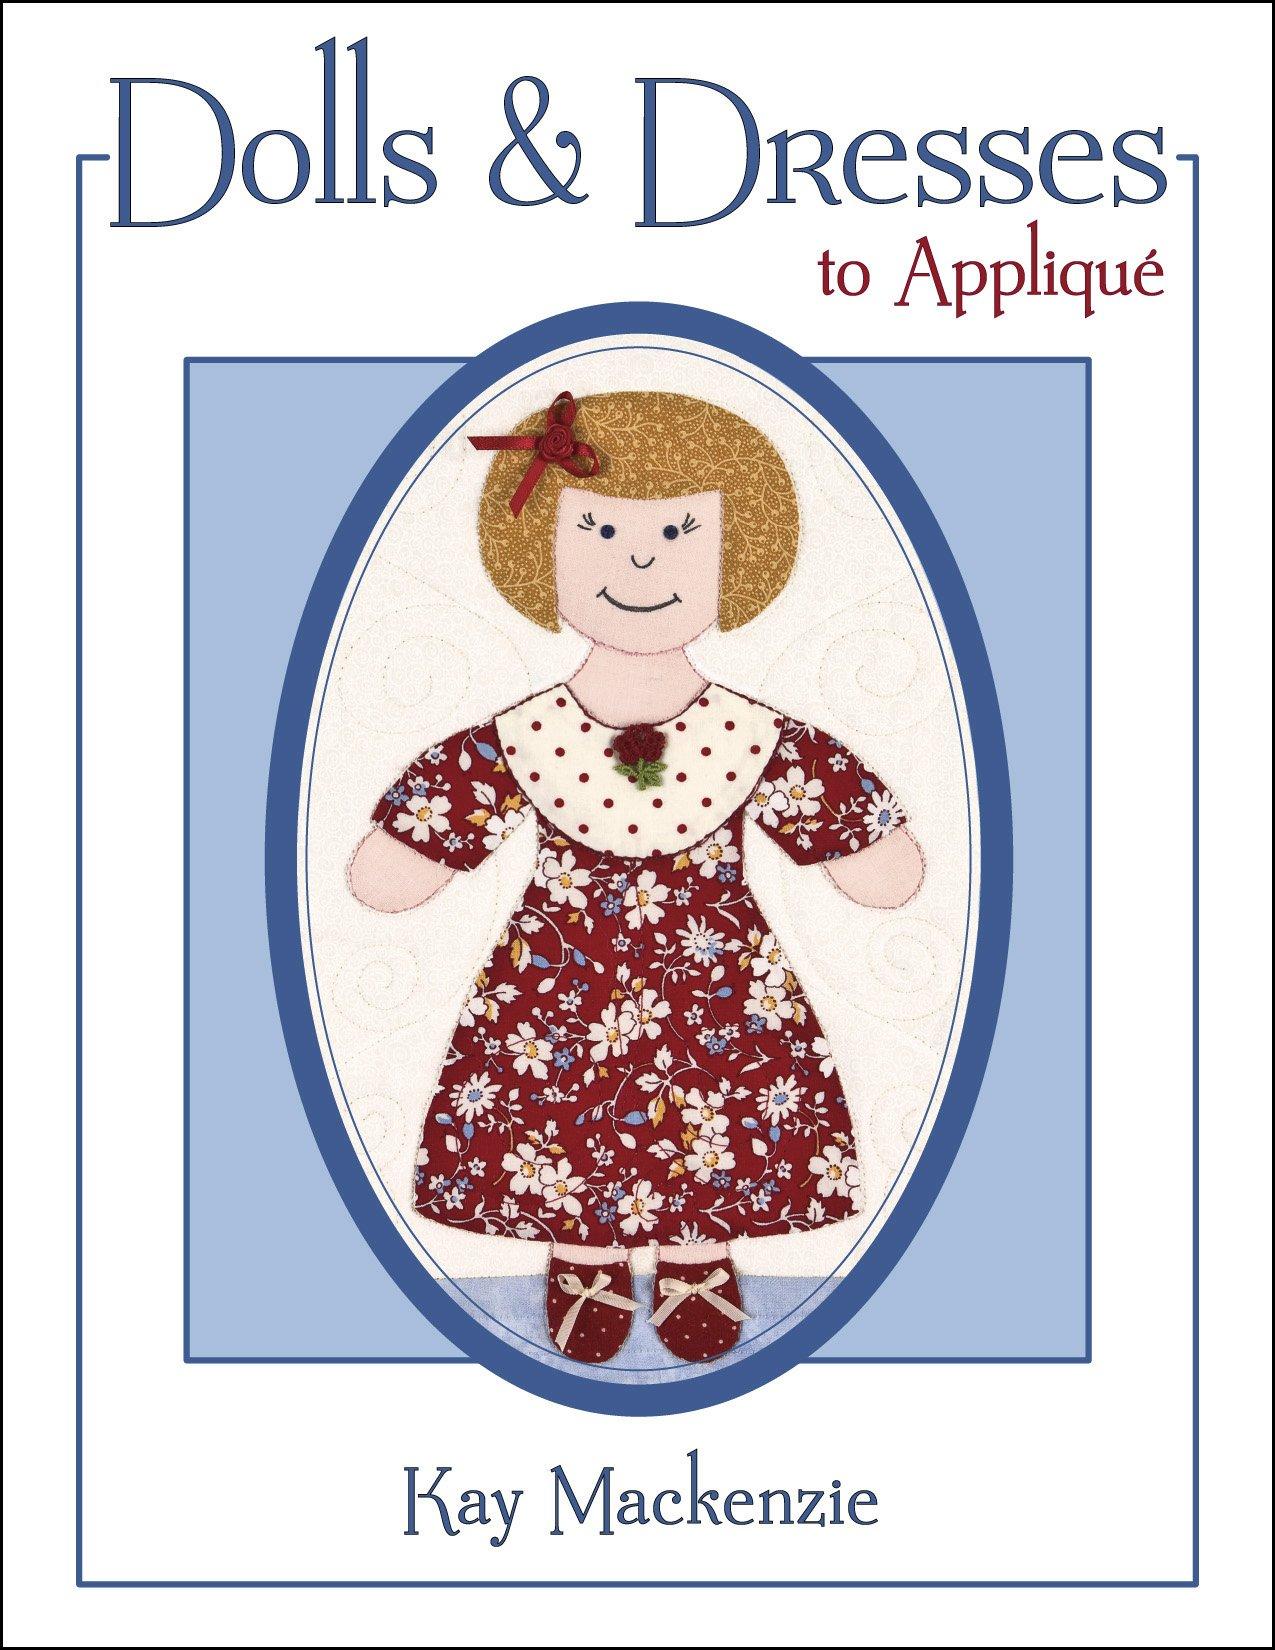 Dolls & Dresses to Applique